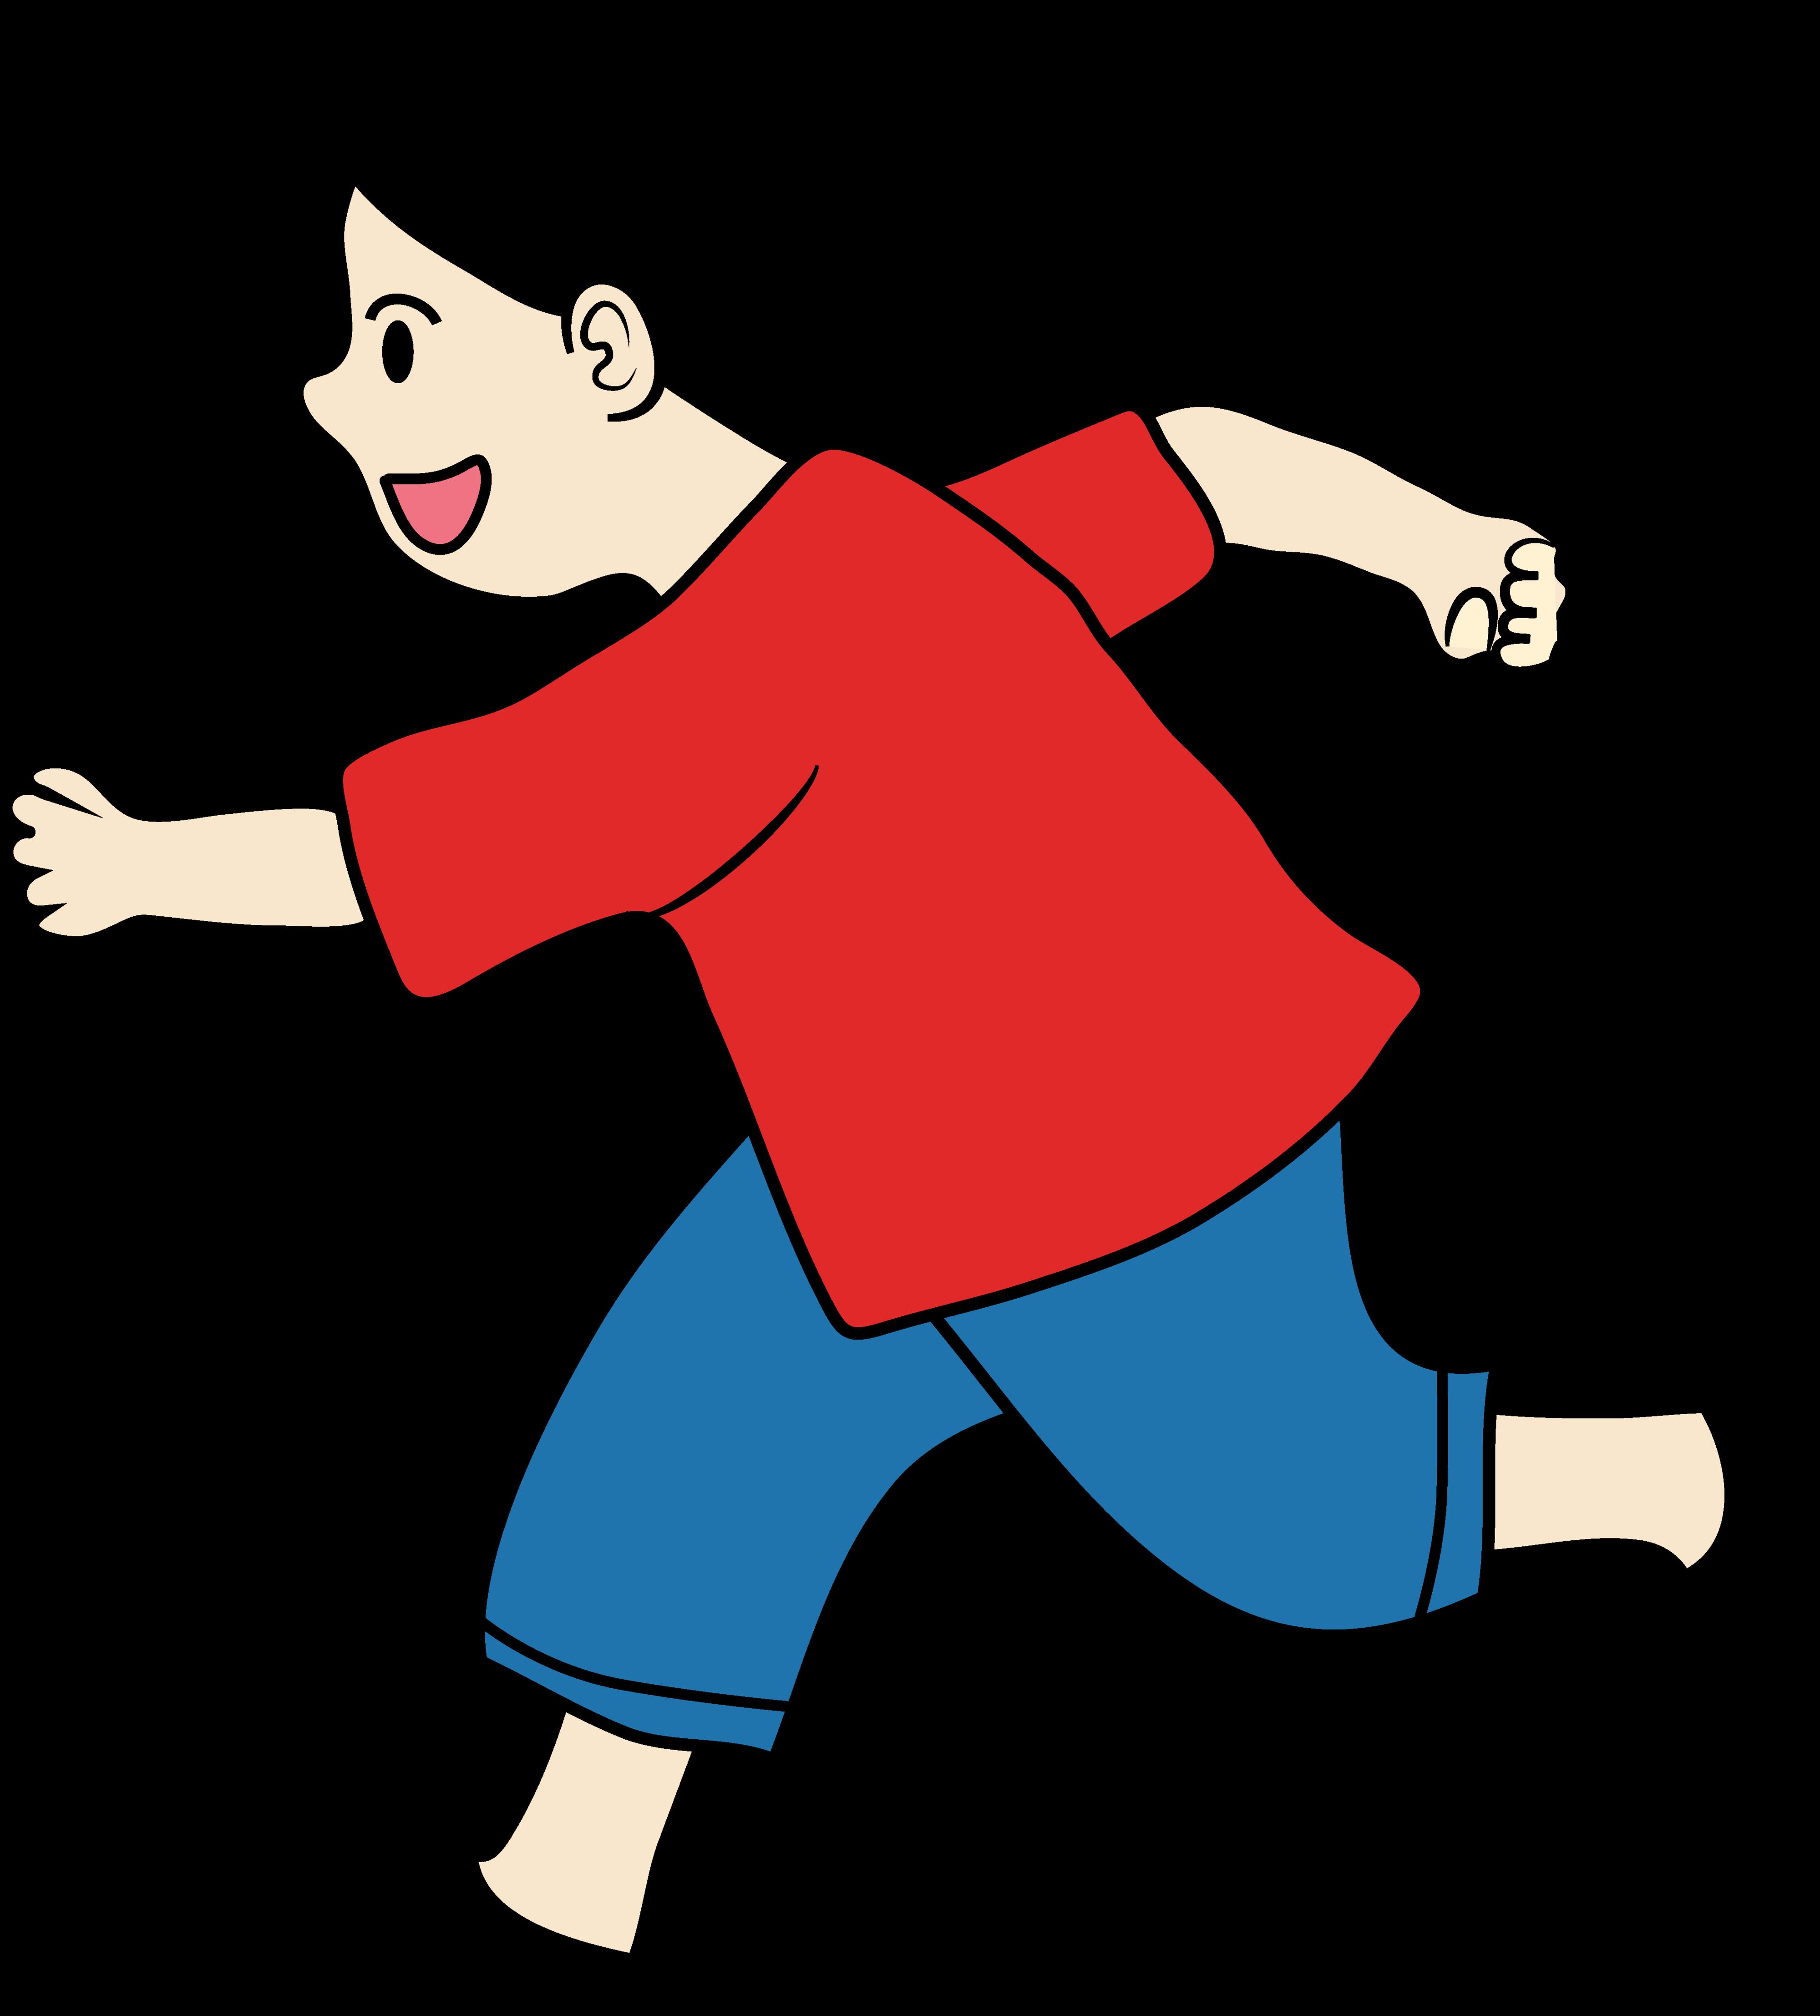 Clipart walking jog in place. Running child clip art